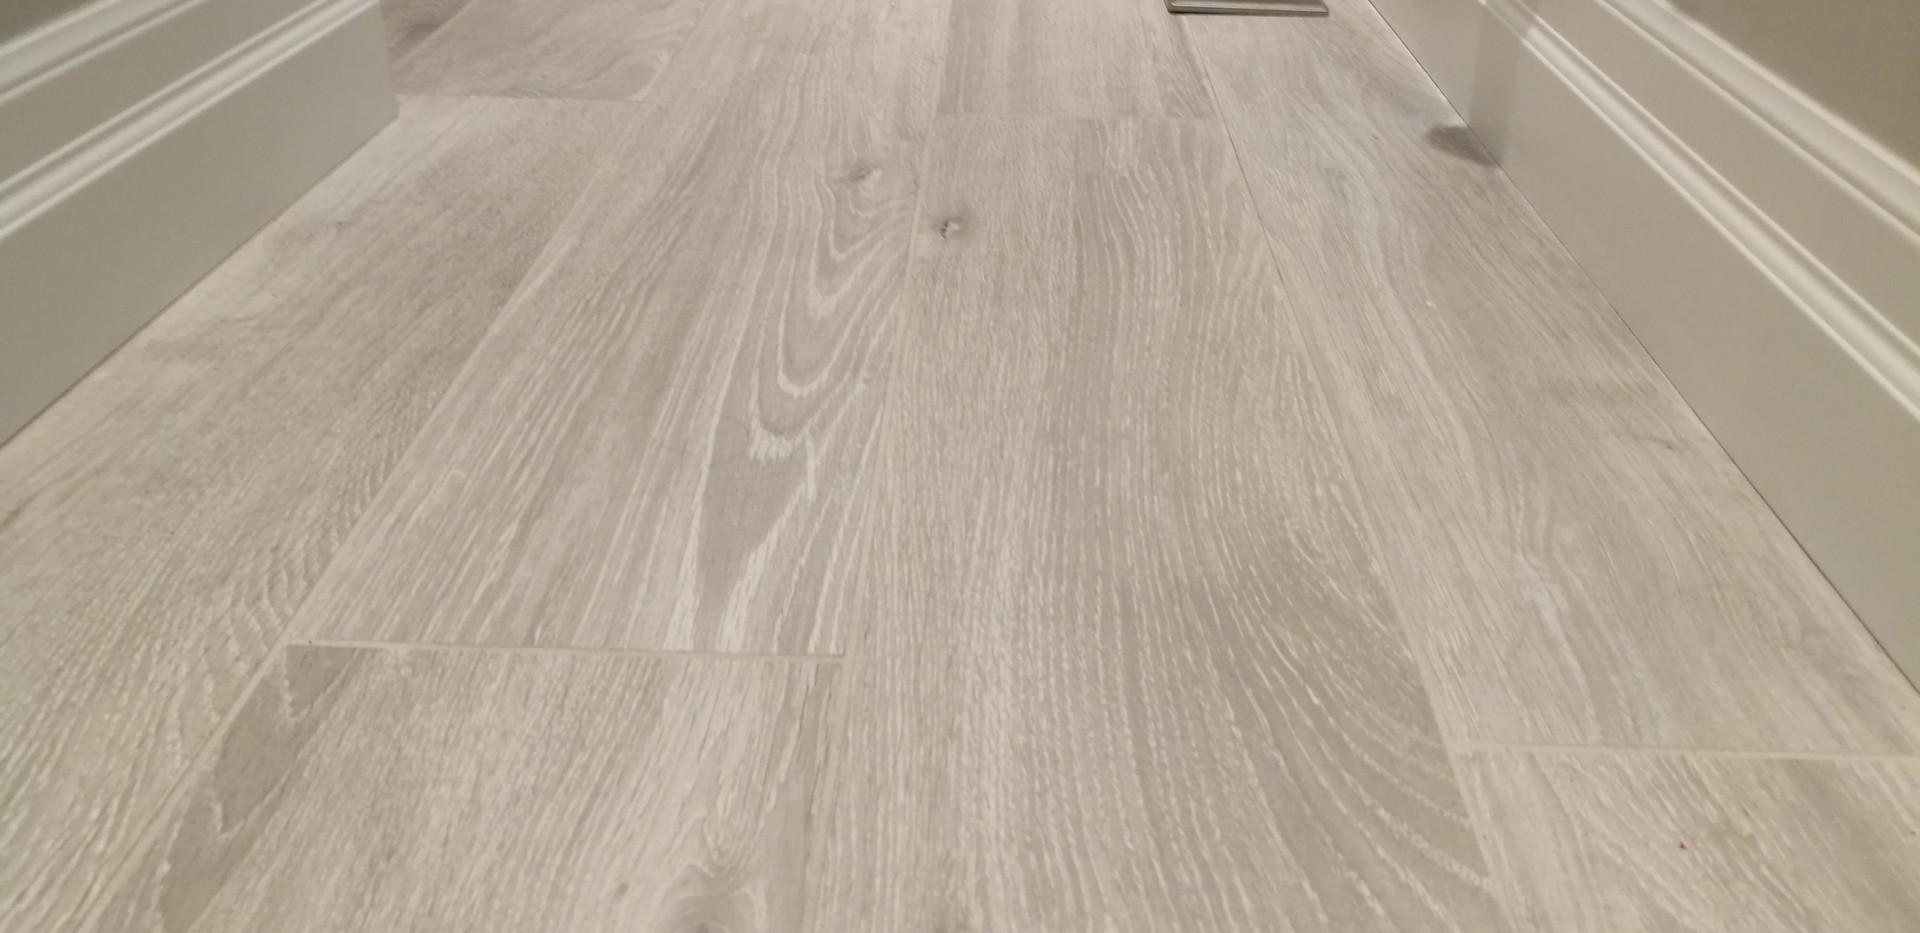 Wood Look Plank Tile